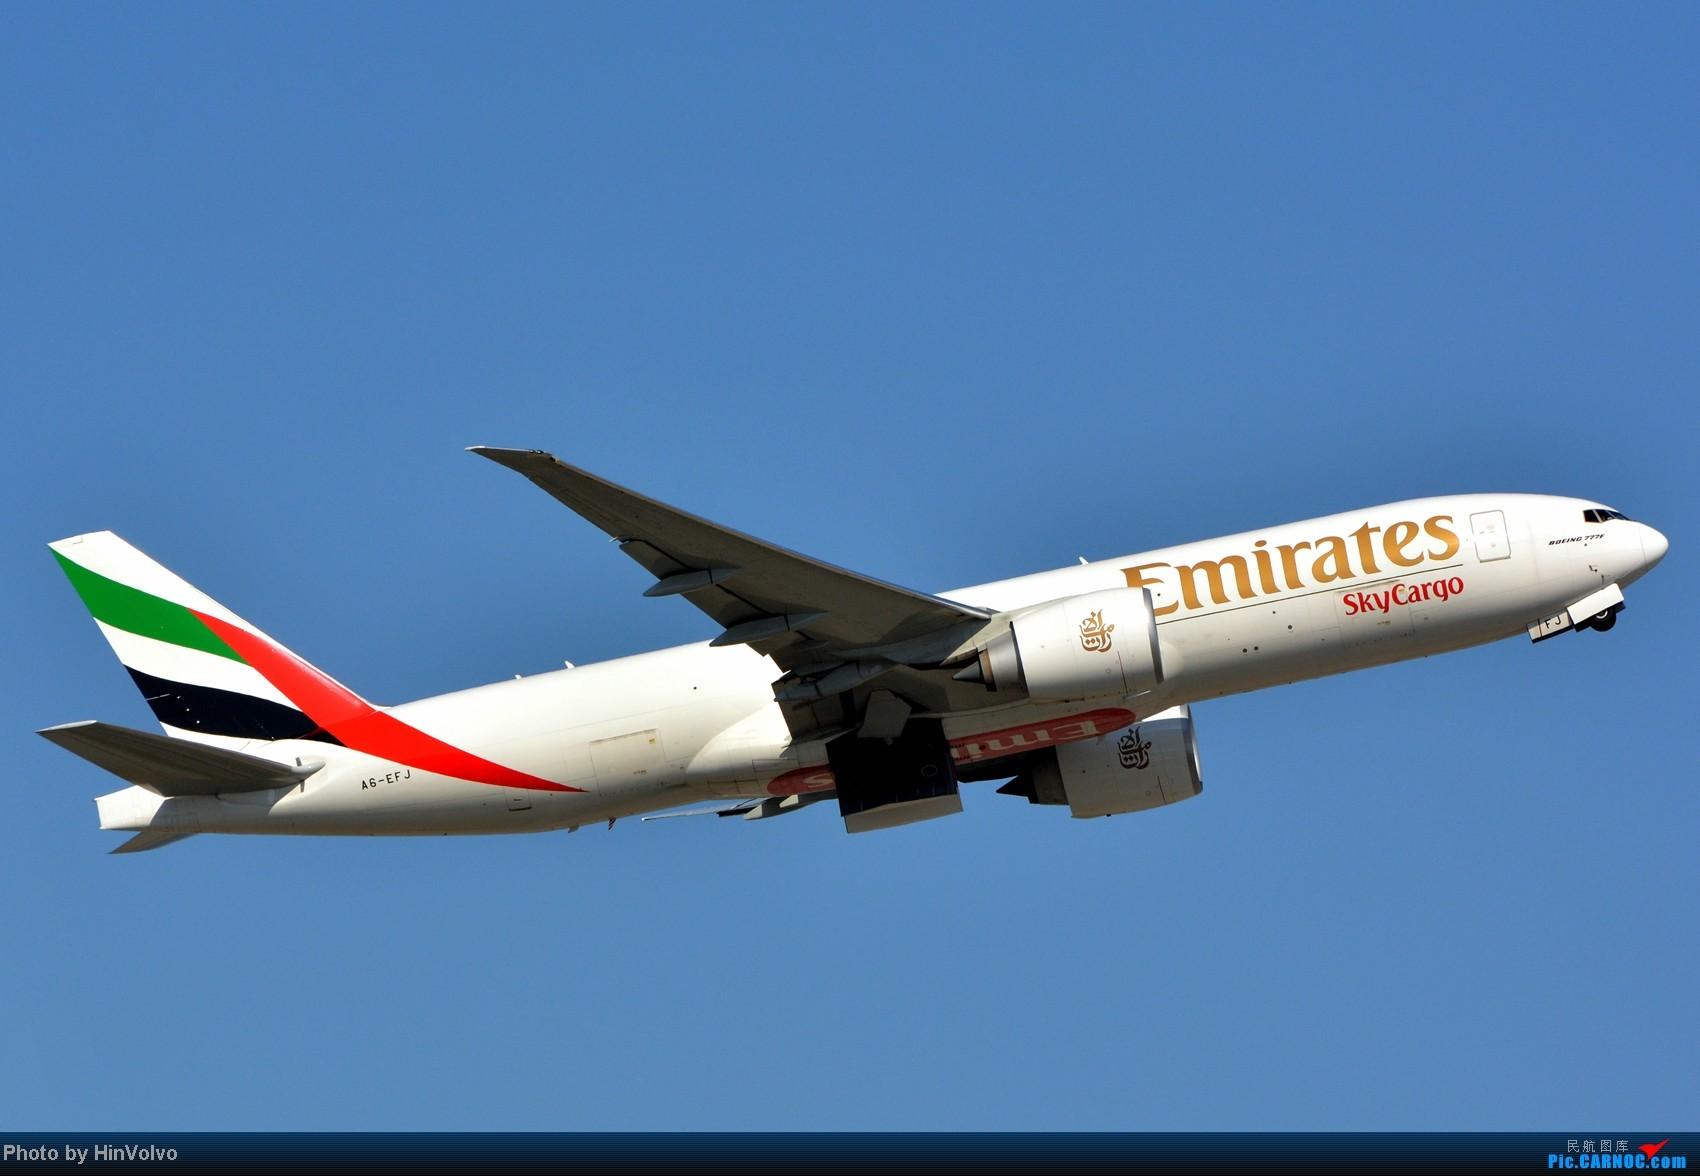 Re:[原创]~~~~多圖系列~~~HKG,早上好!寒冷的天氣出發前往機場拍到中午。 BOEING 777-200 A6-EFJ 中国香港赤鱲角机场